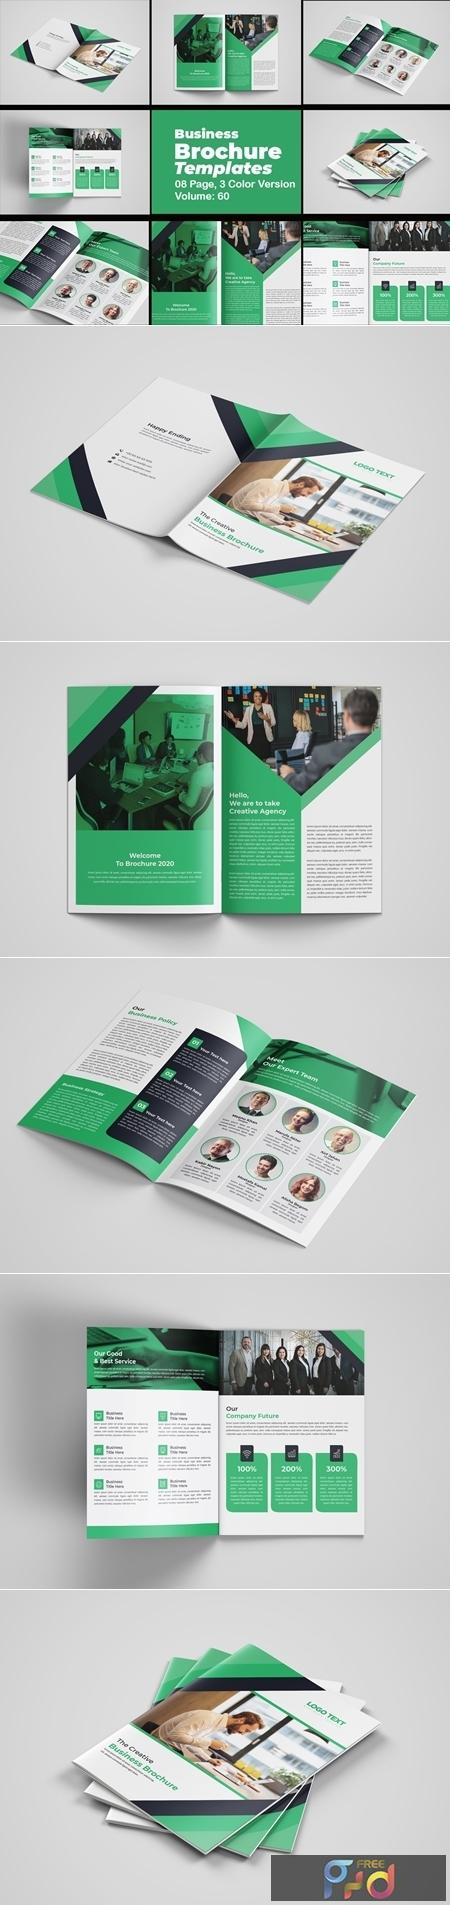 Brochure Template 4520186 1